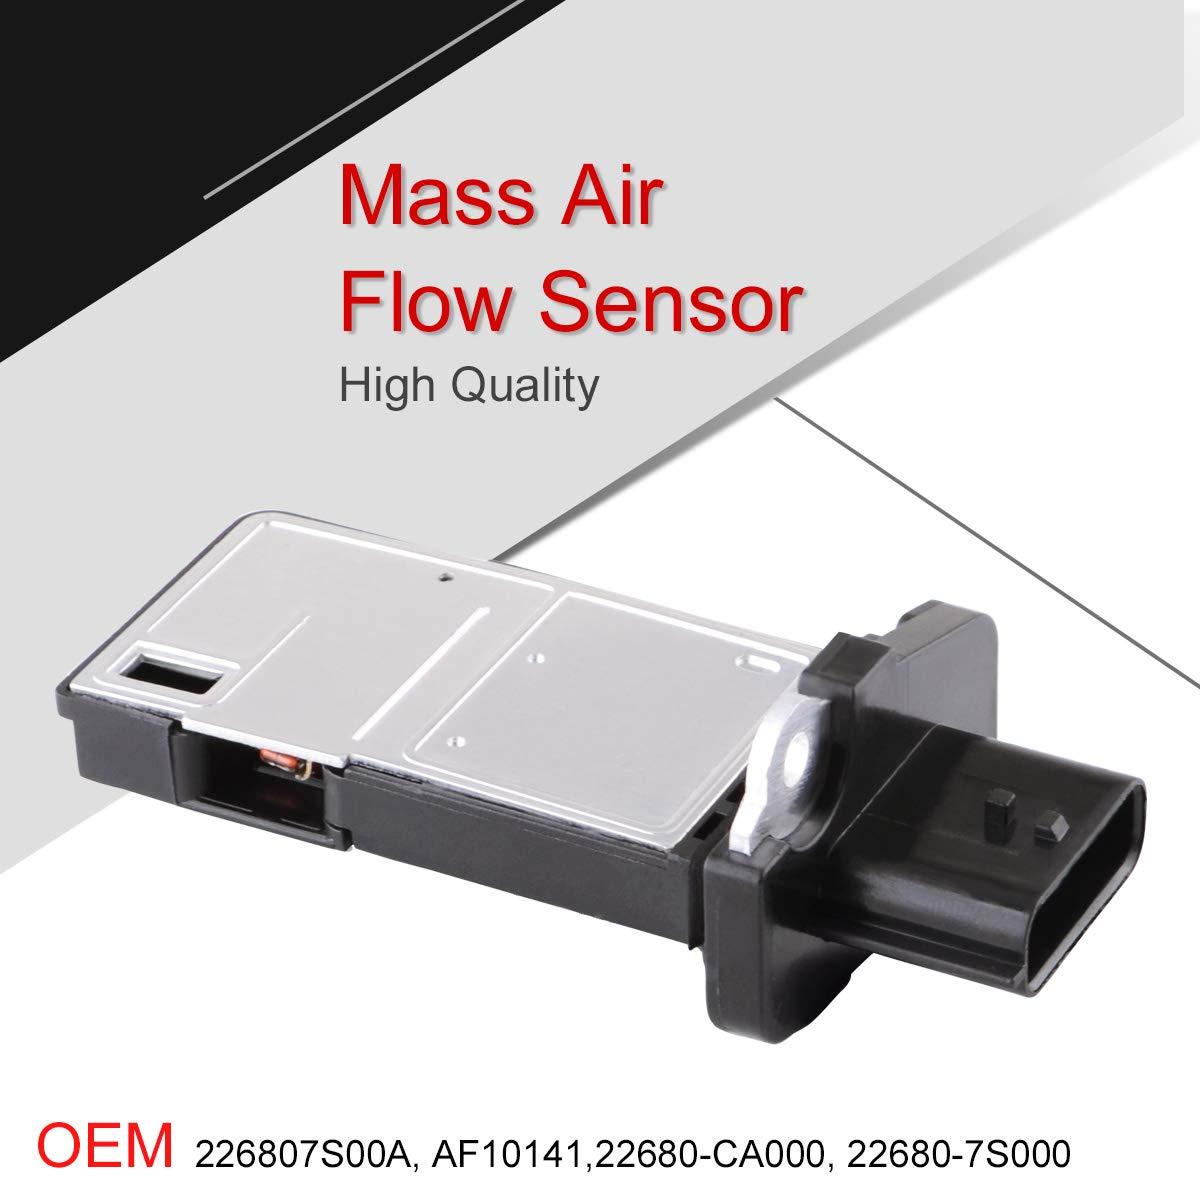 ESPEEDER MAF Sensor Mass Air Flow Meter 22680-7S000 22680-CA000 for Nissan 370Z/Altima/Armada/Frontier Sentra Pathfinder/Infiniti/FX35/G37/QX50/Peugeot 206/Suzuki Equator /& More